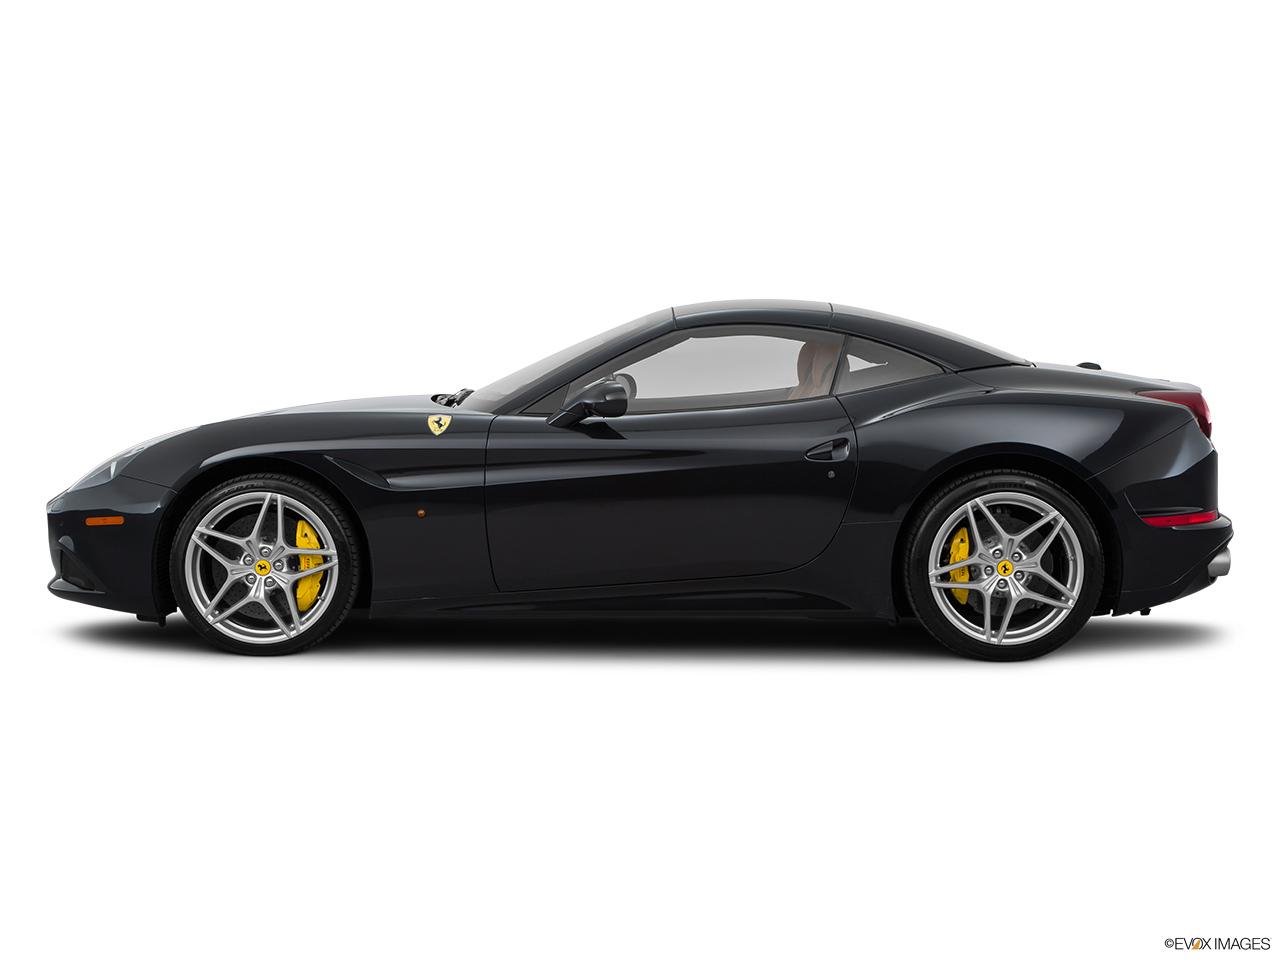 2c72fa028 Ferrari California T 2016 3.8, Oman, Drivers side profile, convertible top  up (